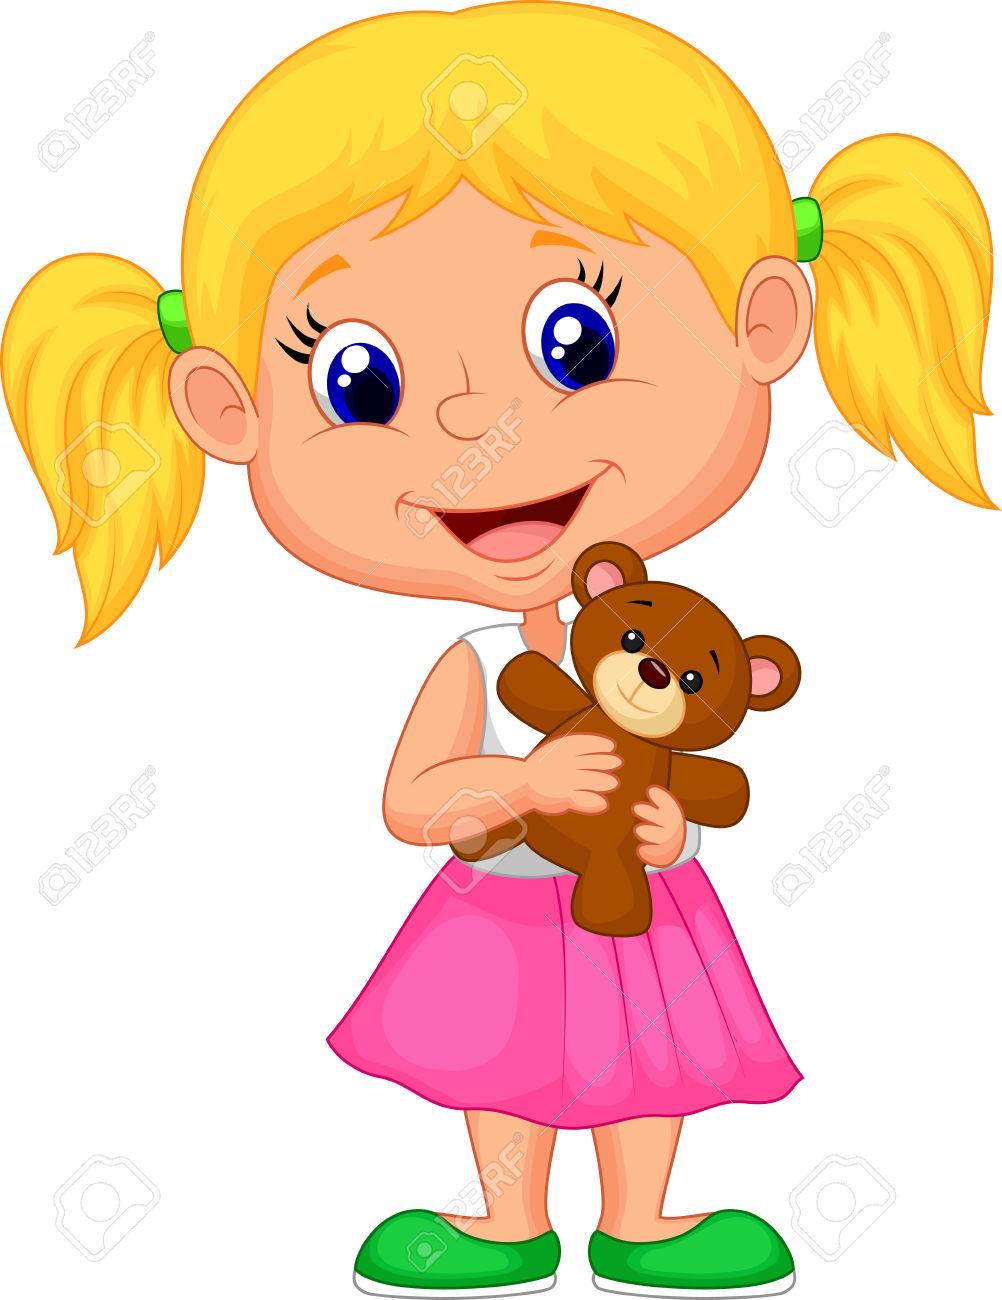 27167151-Little-girl-cartoon-holding-bear-stuff-Stock-Vector.jpg